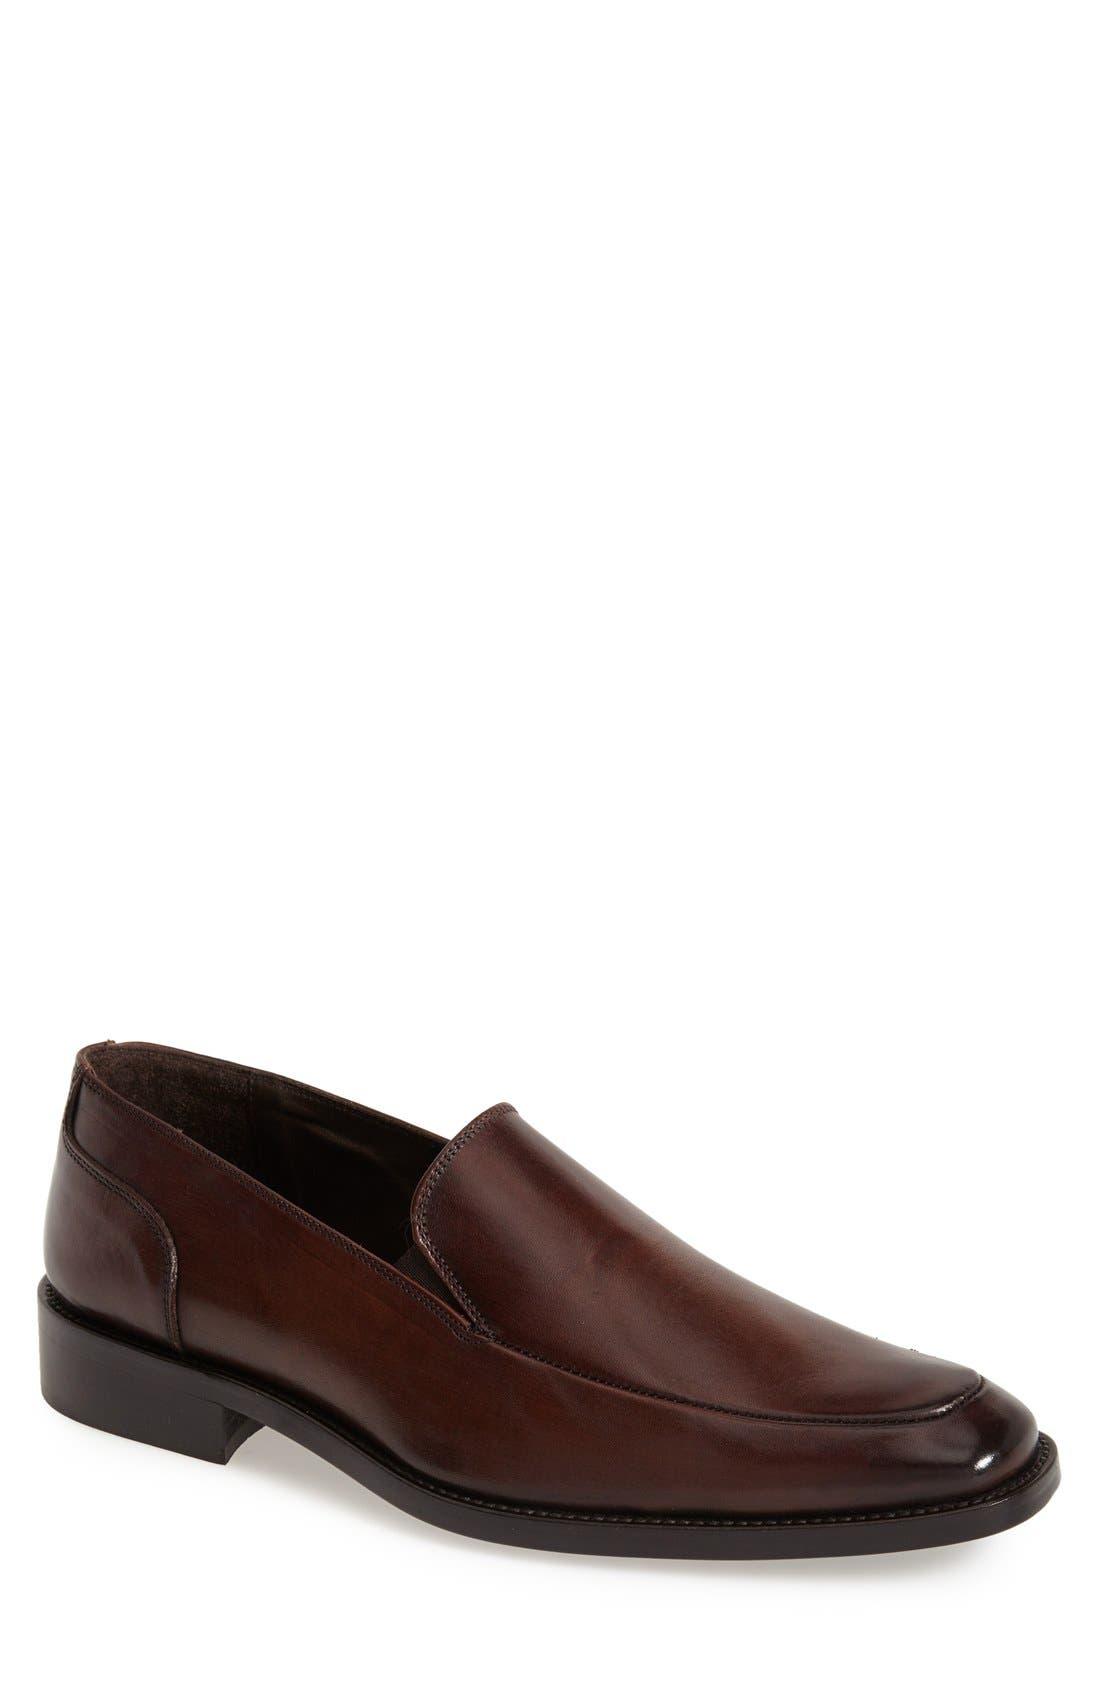 Alternate Image 1 Selected - To Boot New York 'Erik' Venetian Loafer